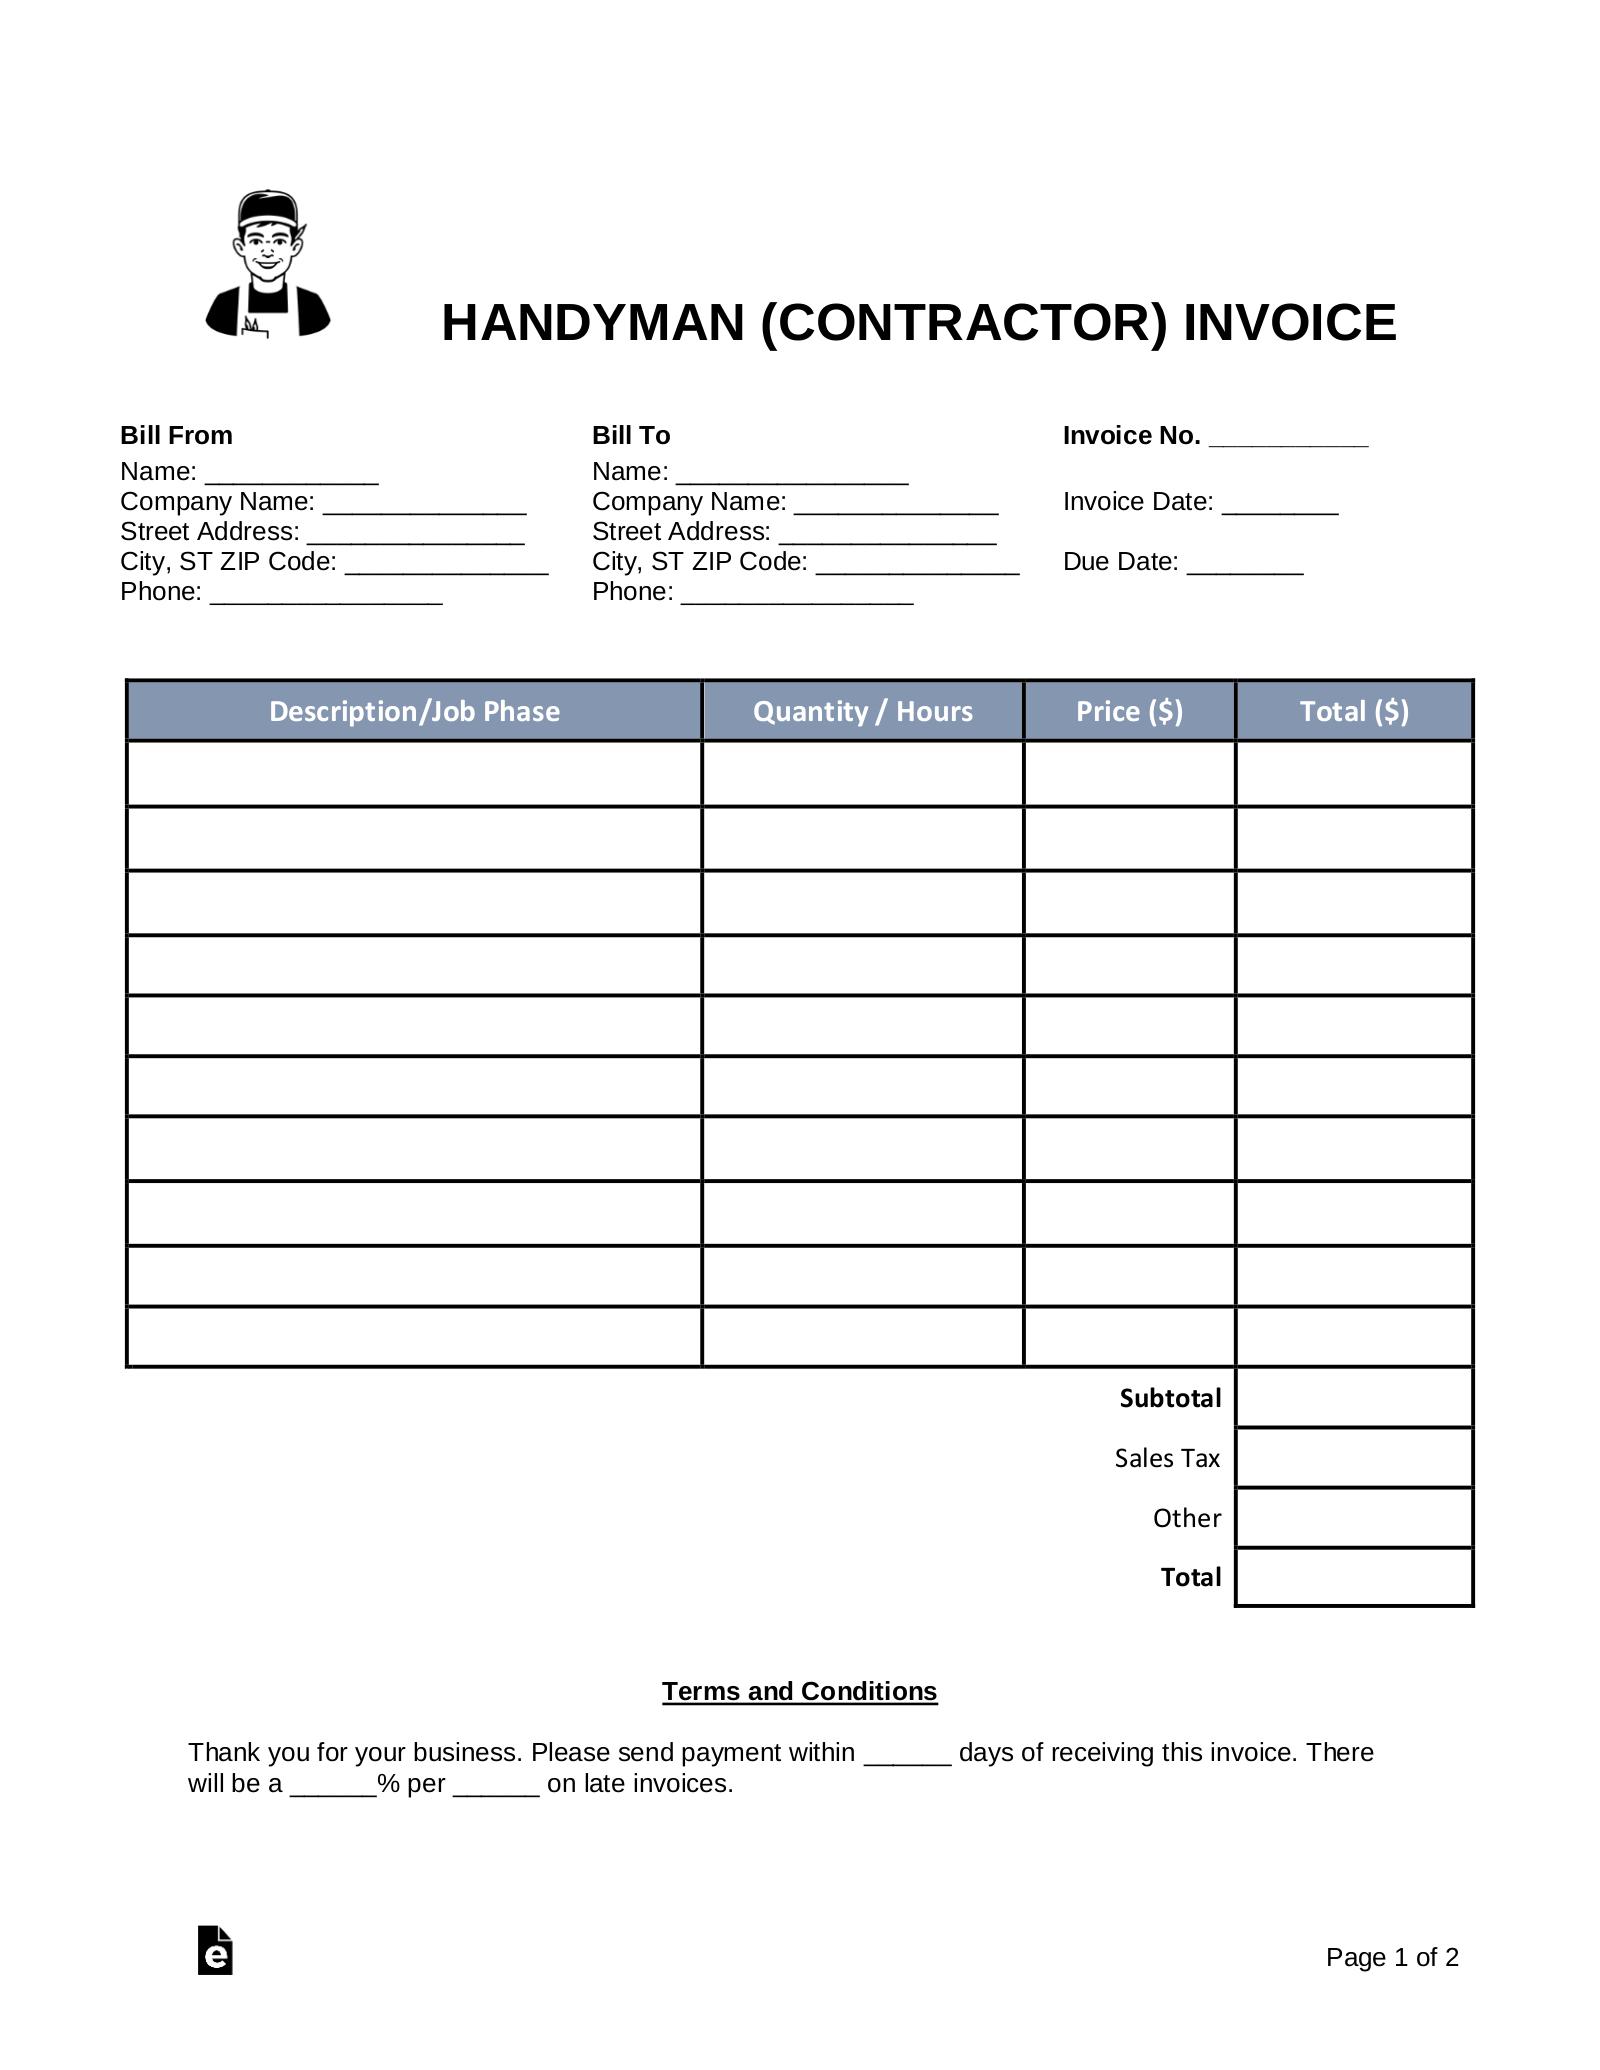 Free Handyman Contractor Invoice Template